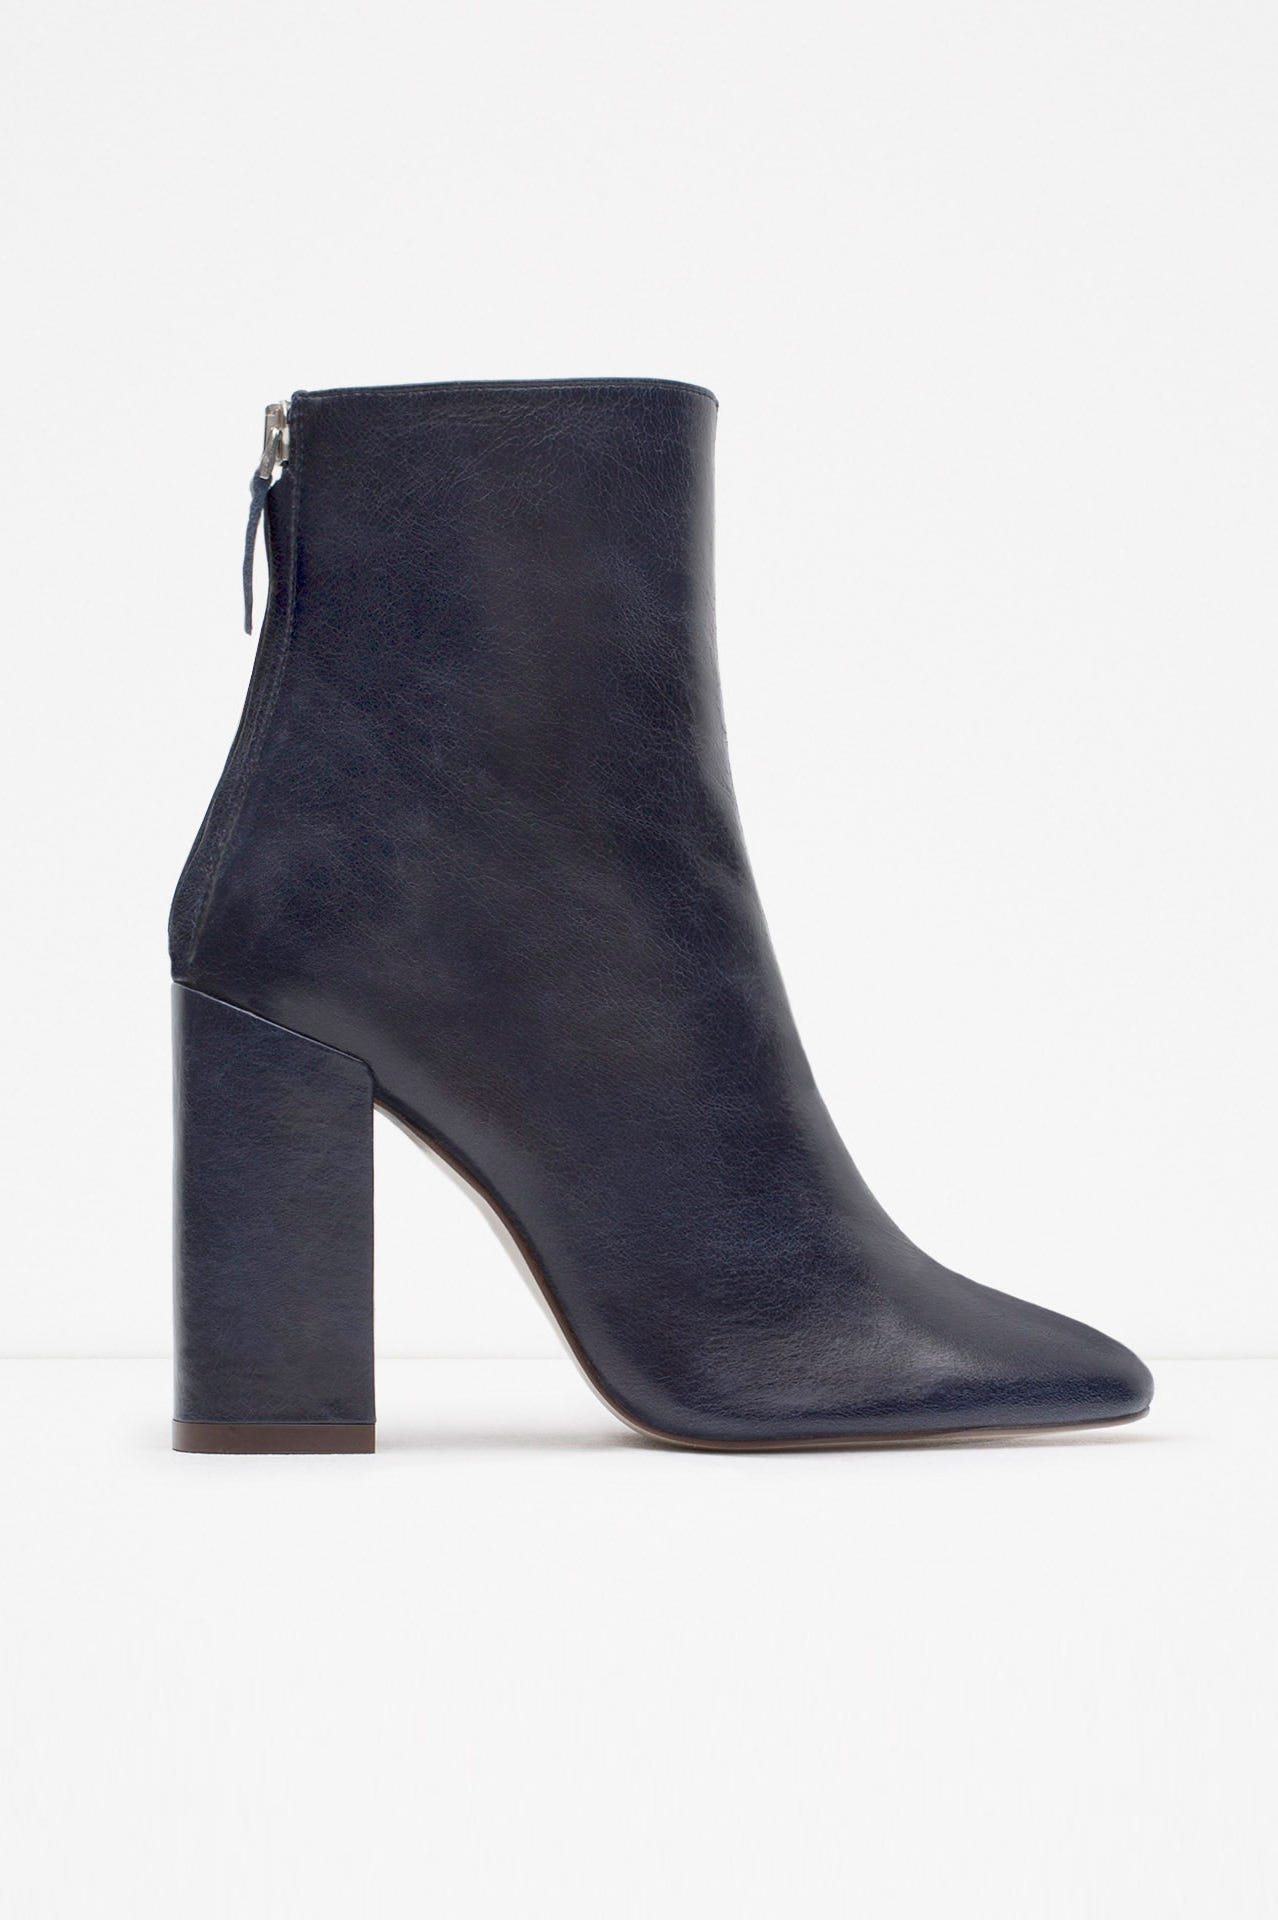 c35da8264110 Zara 2015 Fall Shoes